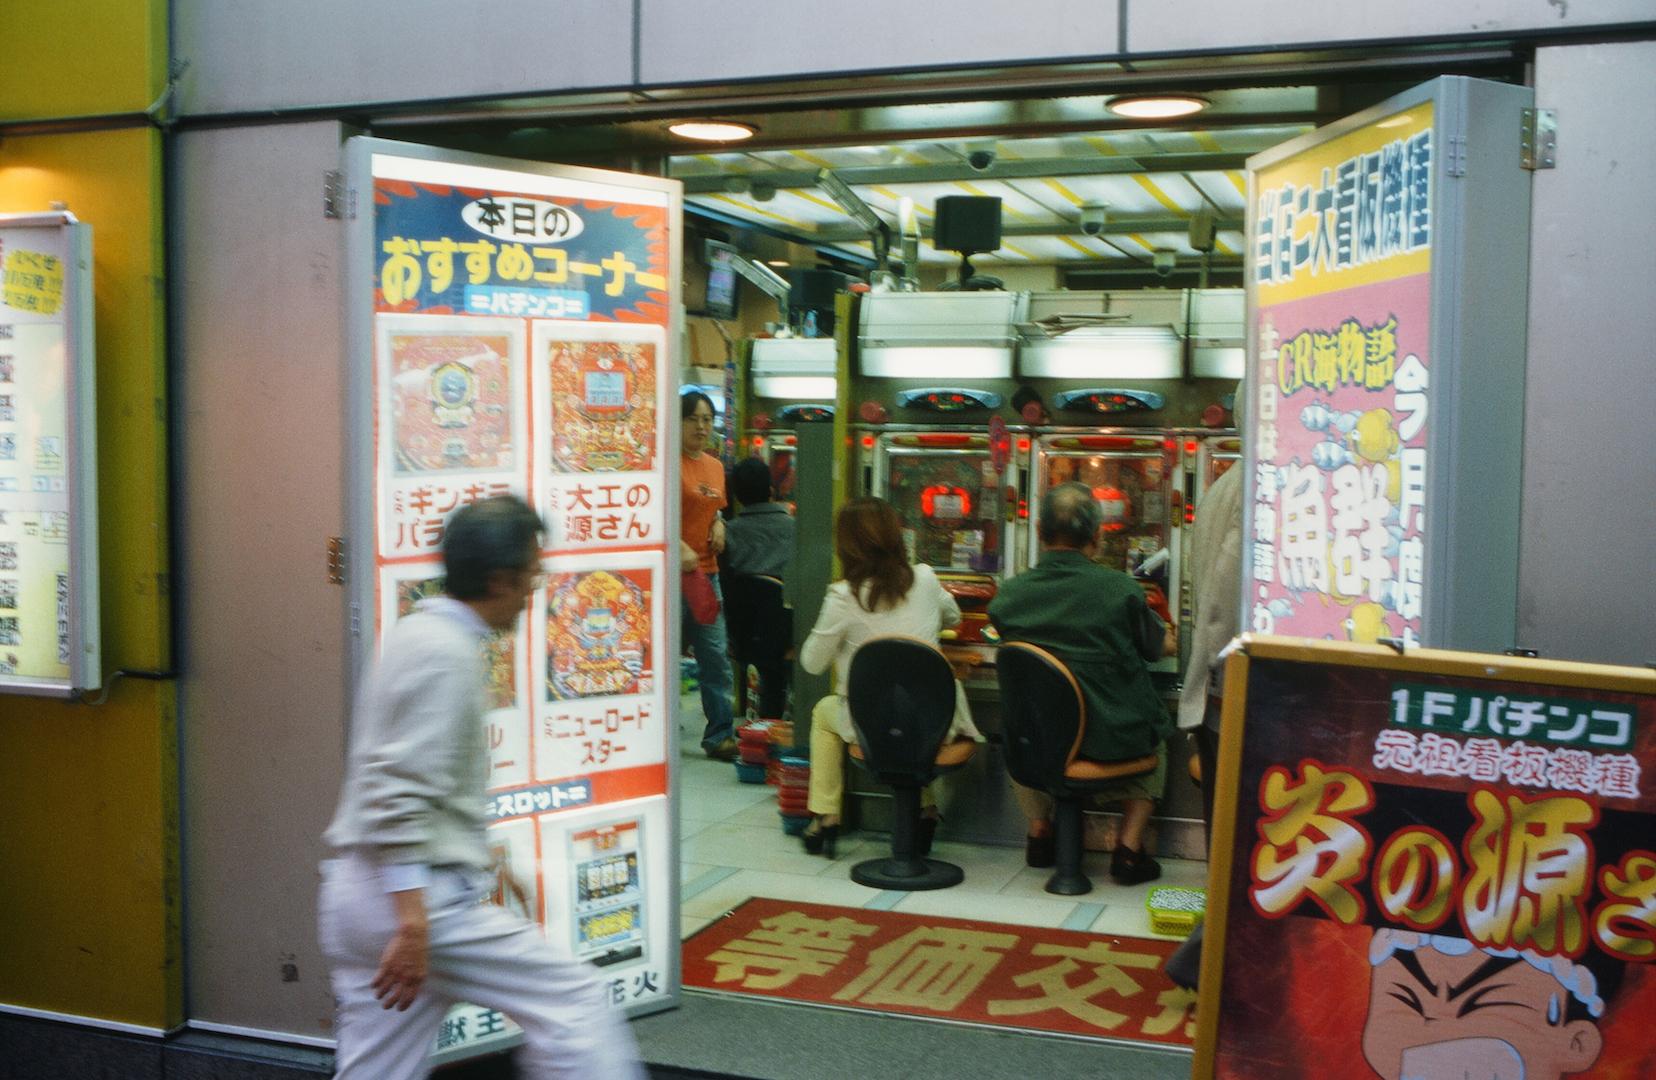 Salle de Pachinko à Tokyo, au Japon - avril 2000. (Copyright : Bruno Birolli)